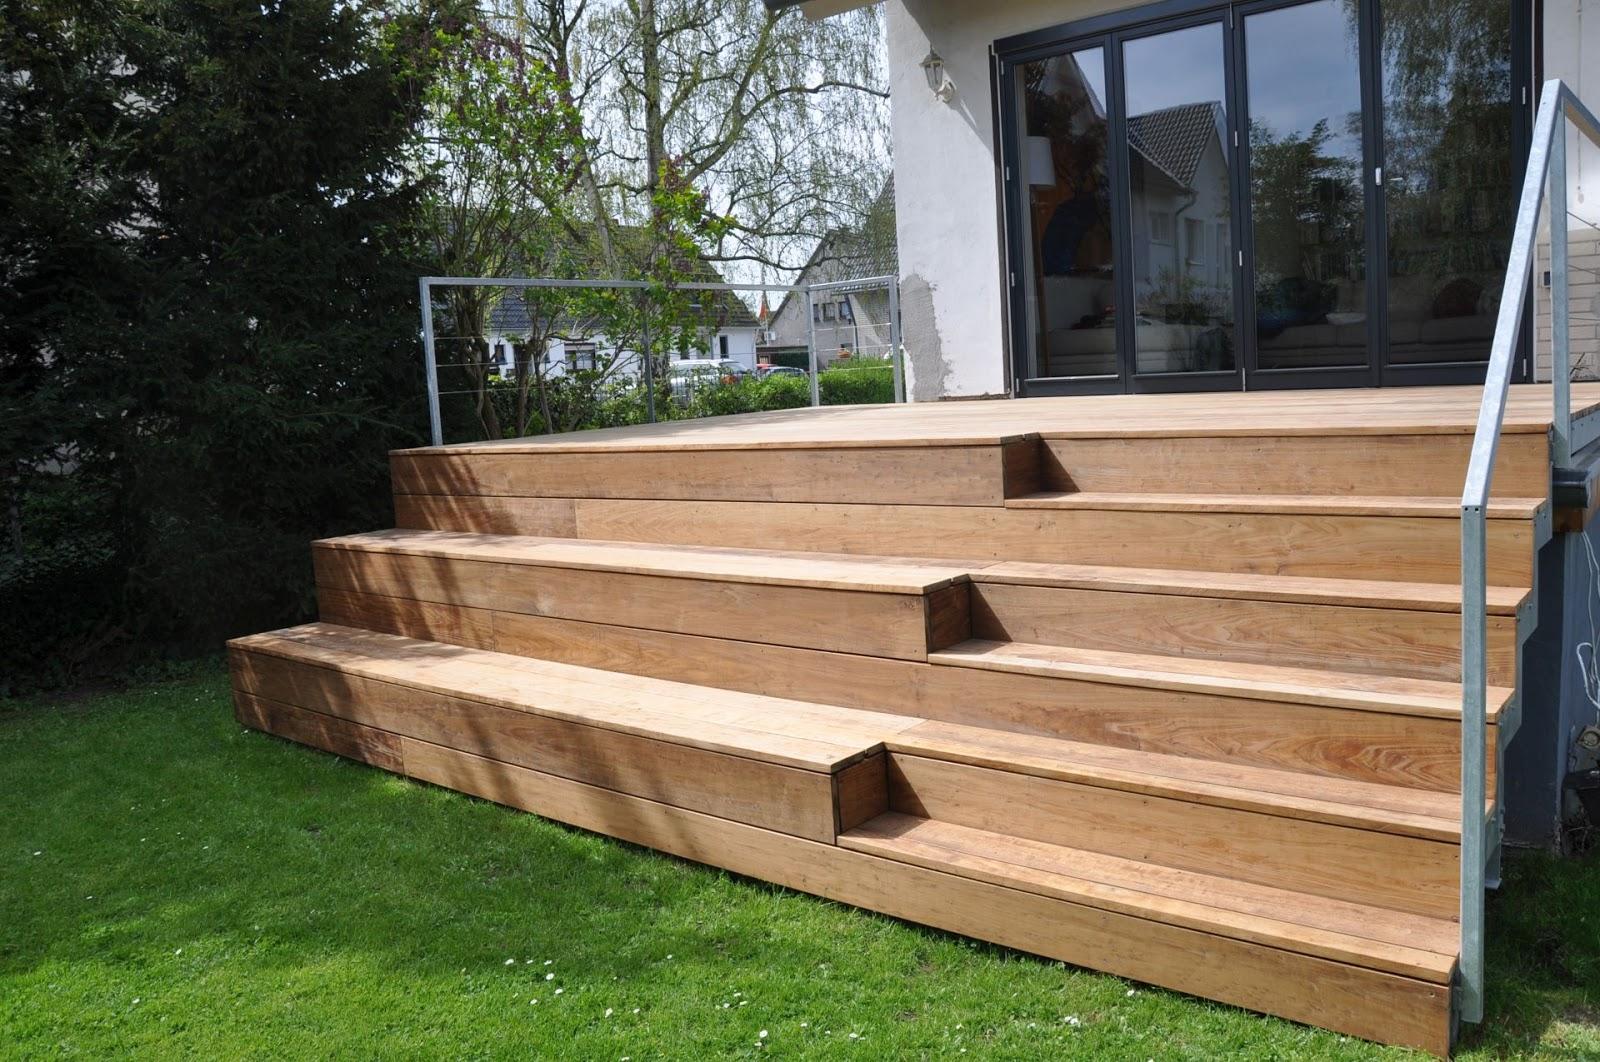 Terrasse Aus Stahl Mit Holzbelag Frobel Metallbau